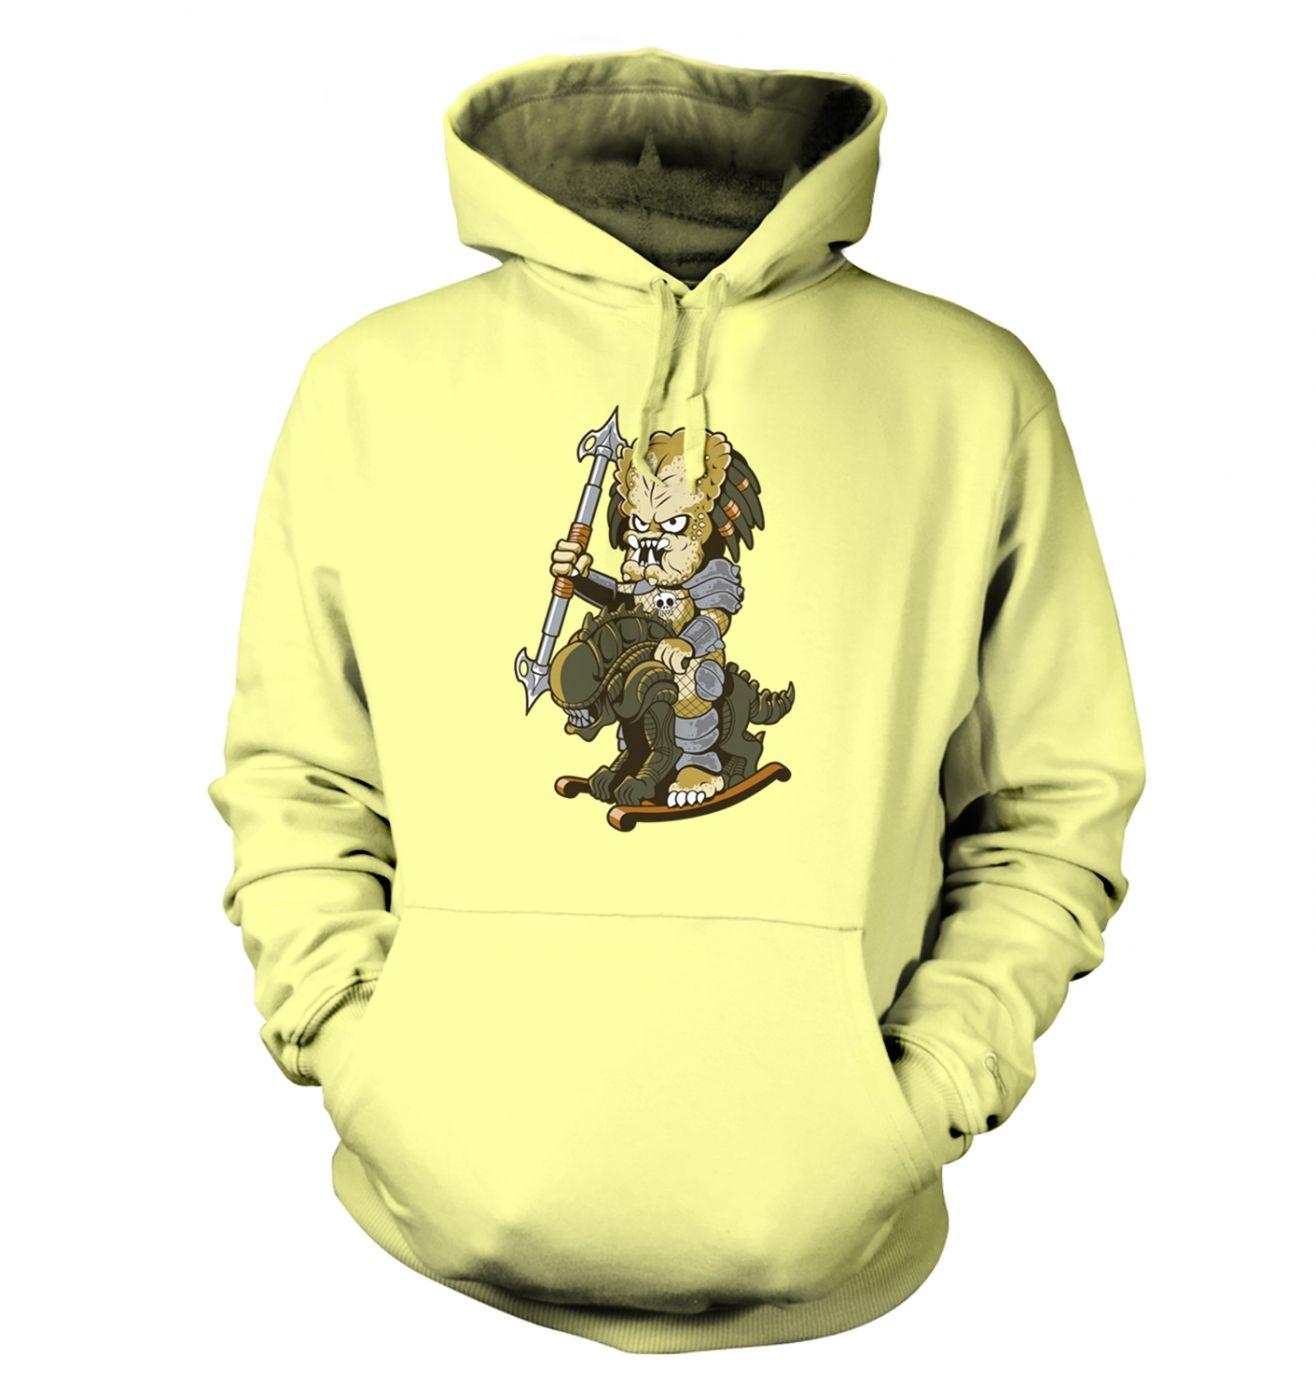 Get To The Rocka hoodie